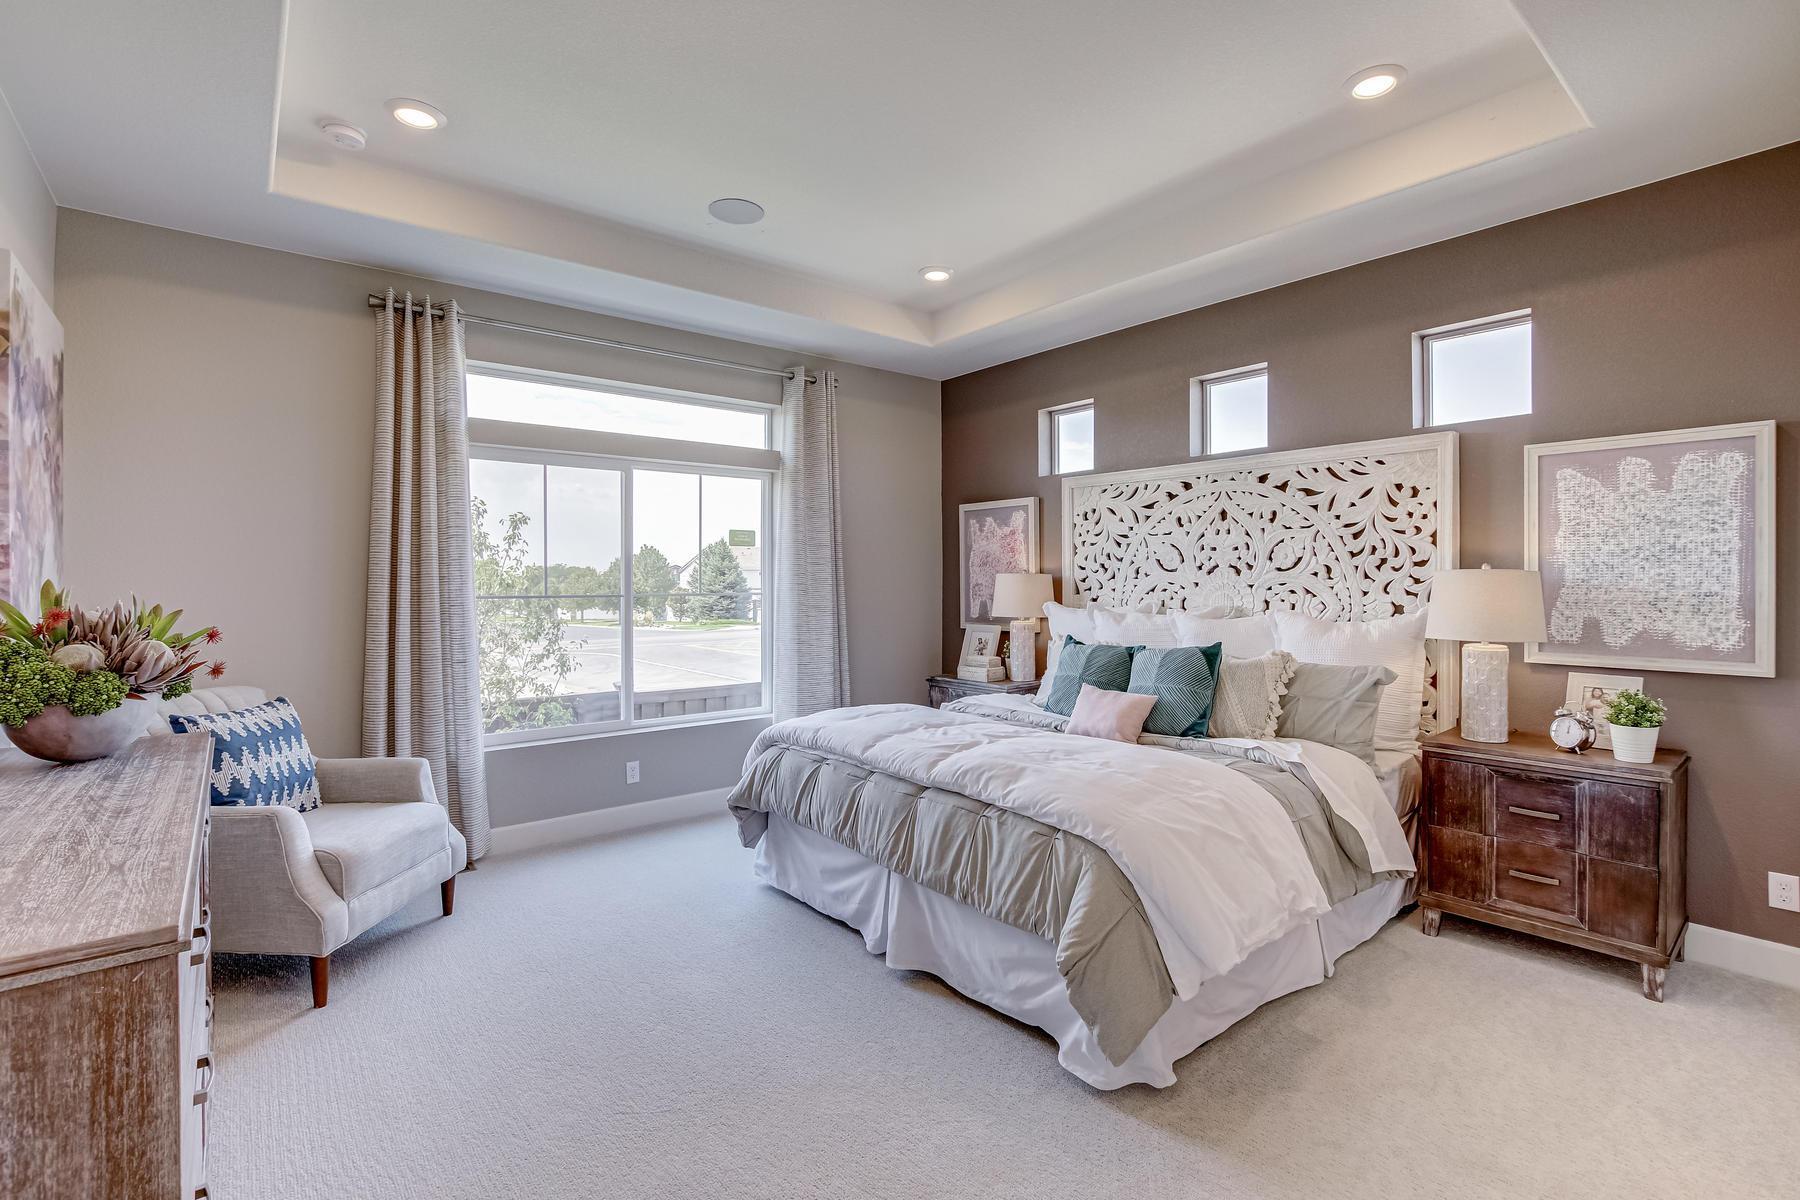 Bedroom featured in the Aspen By OakwoodLife in Denver, CO